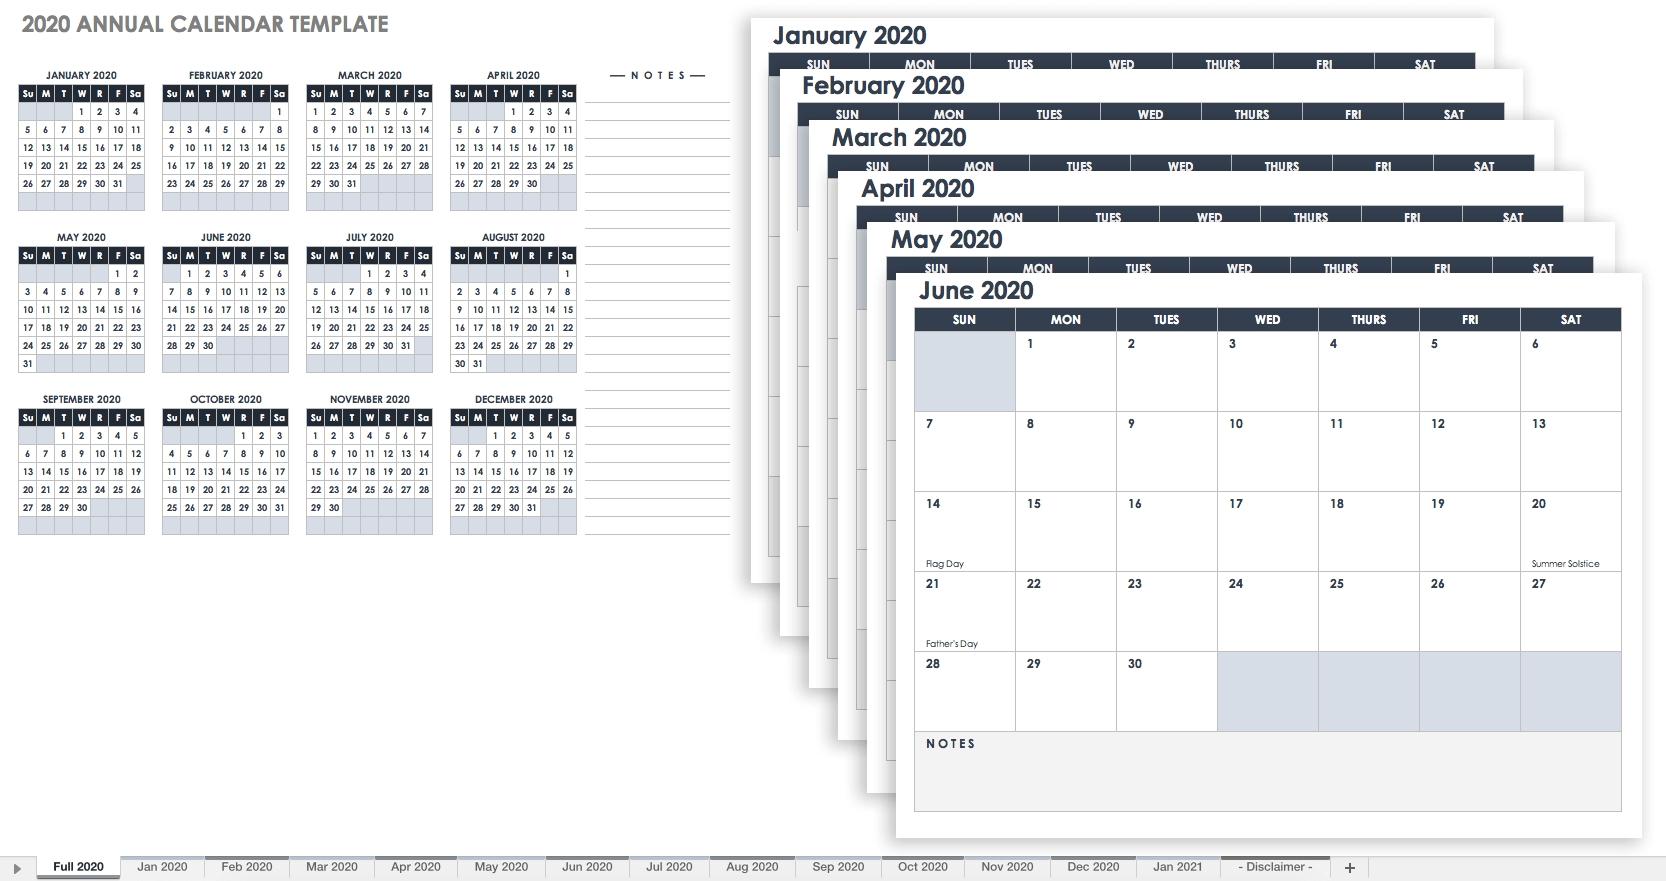 Free Blank Calendar Templates - Smartsheet Blank Calendar Month View